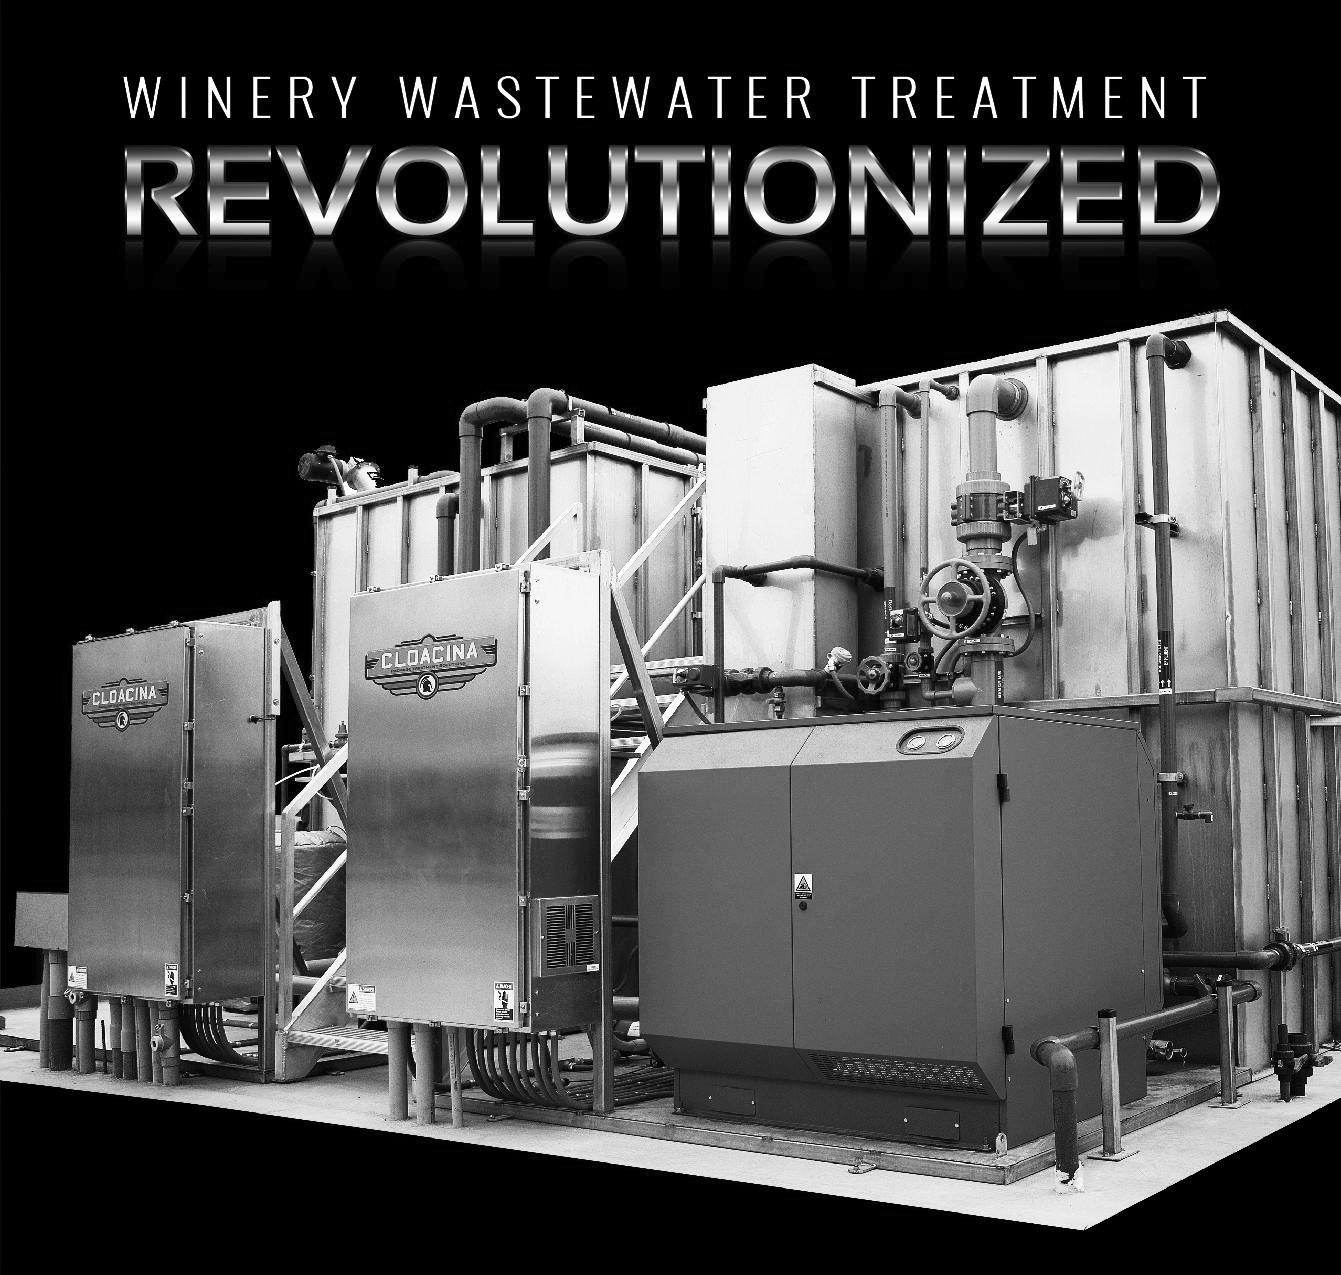 Winery-REVOLUTIONIZED-03.jpg